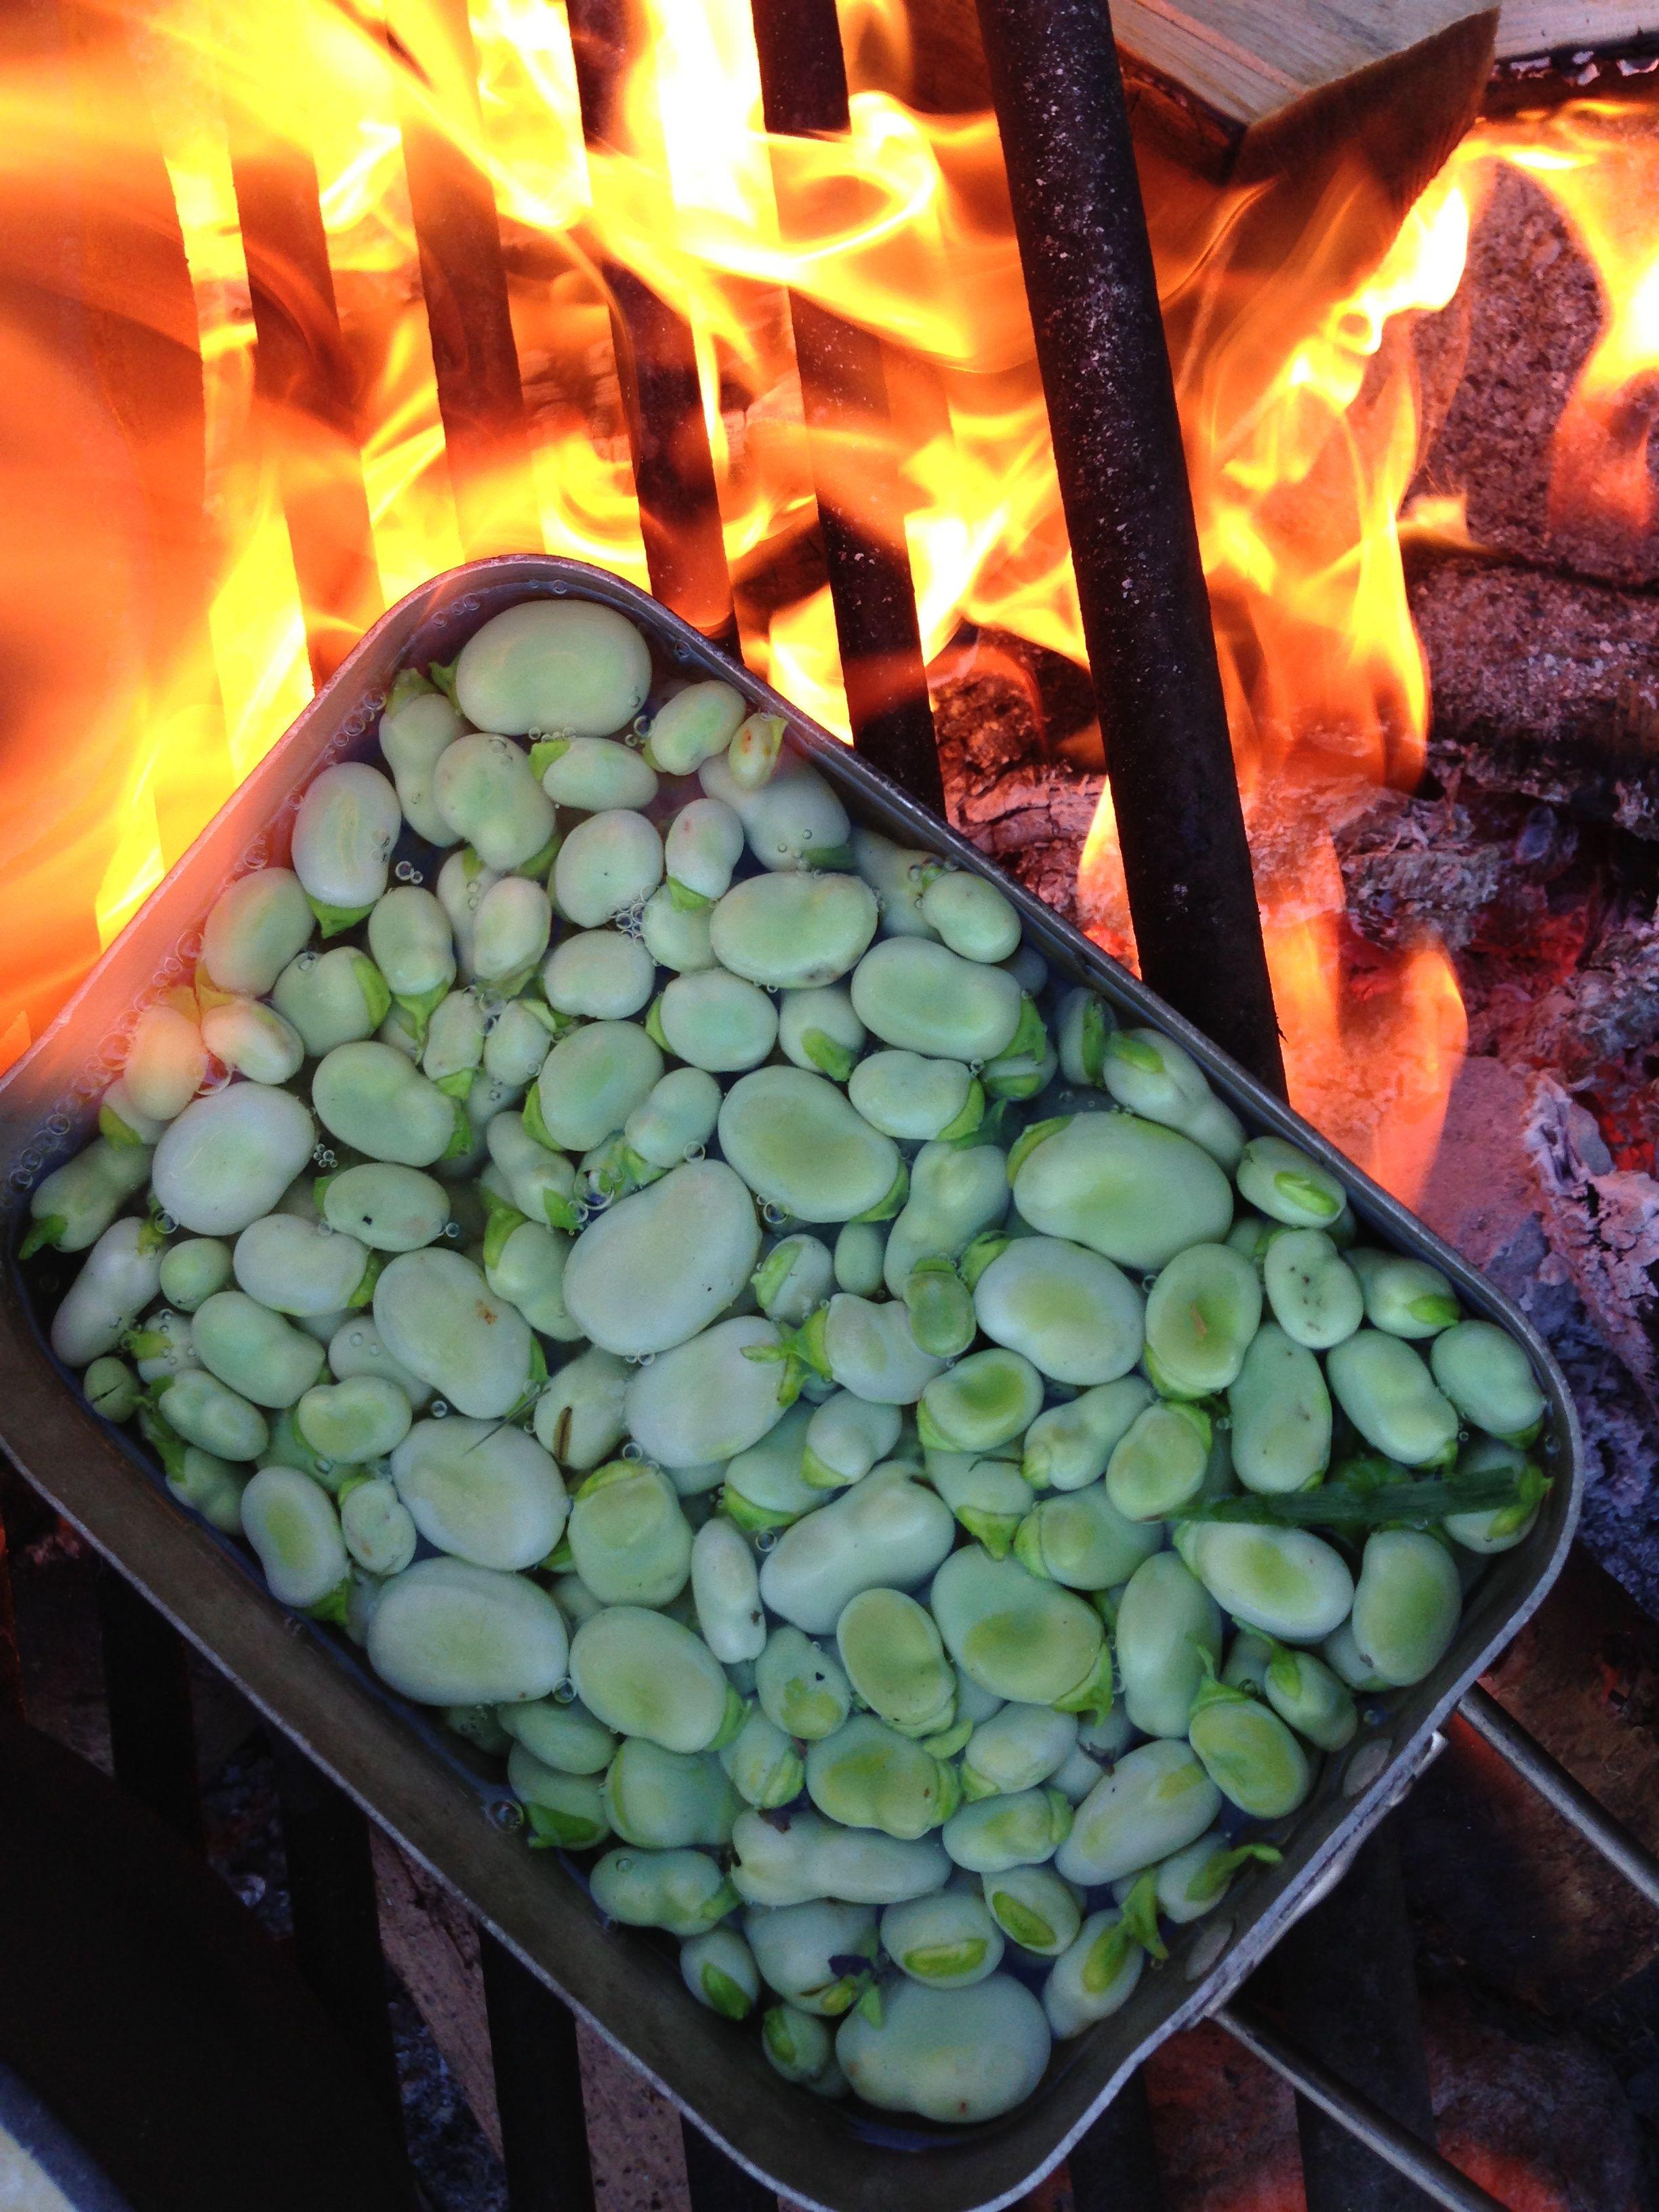 fava beans on campfire.jpg